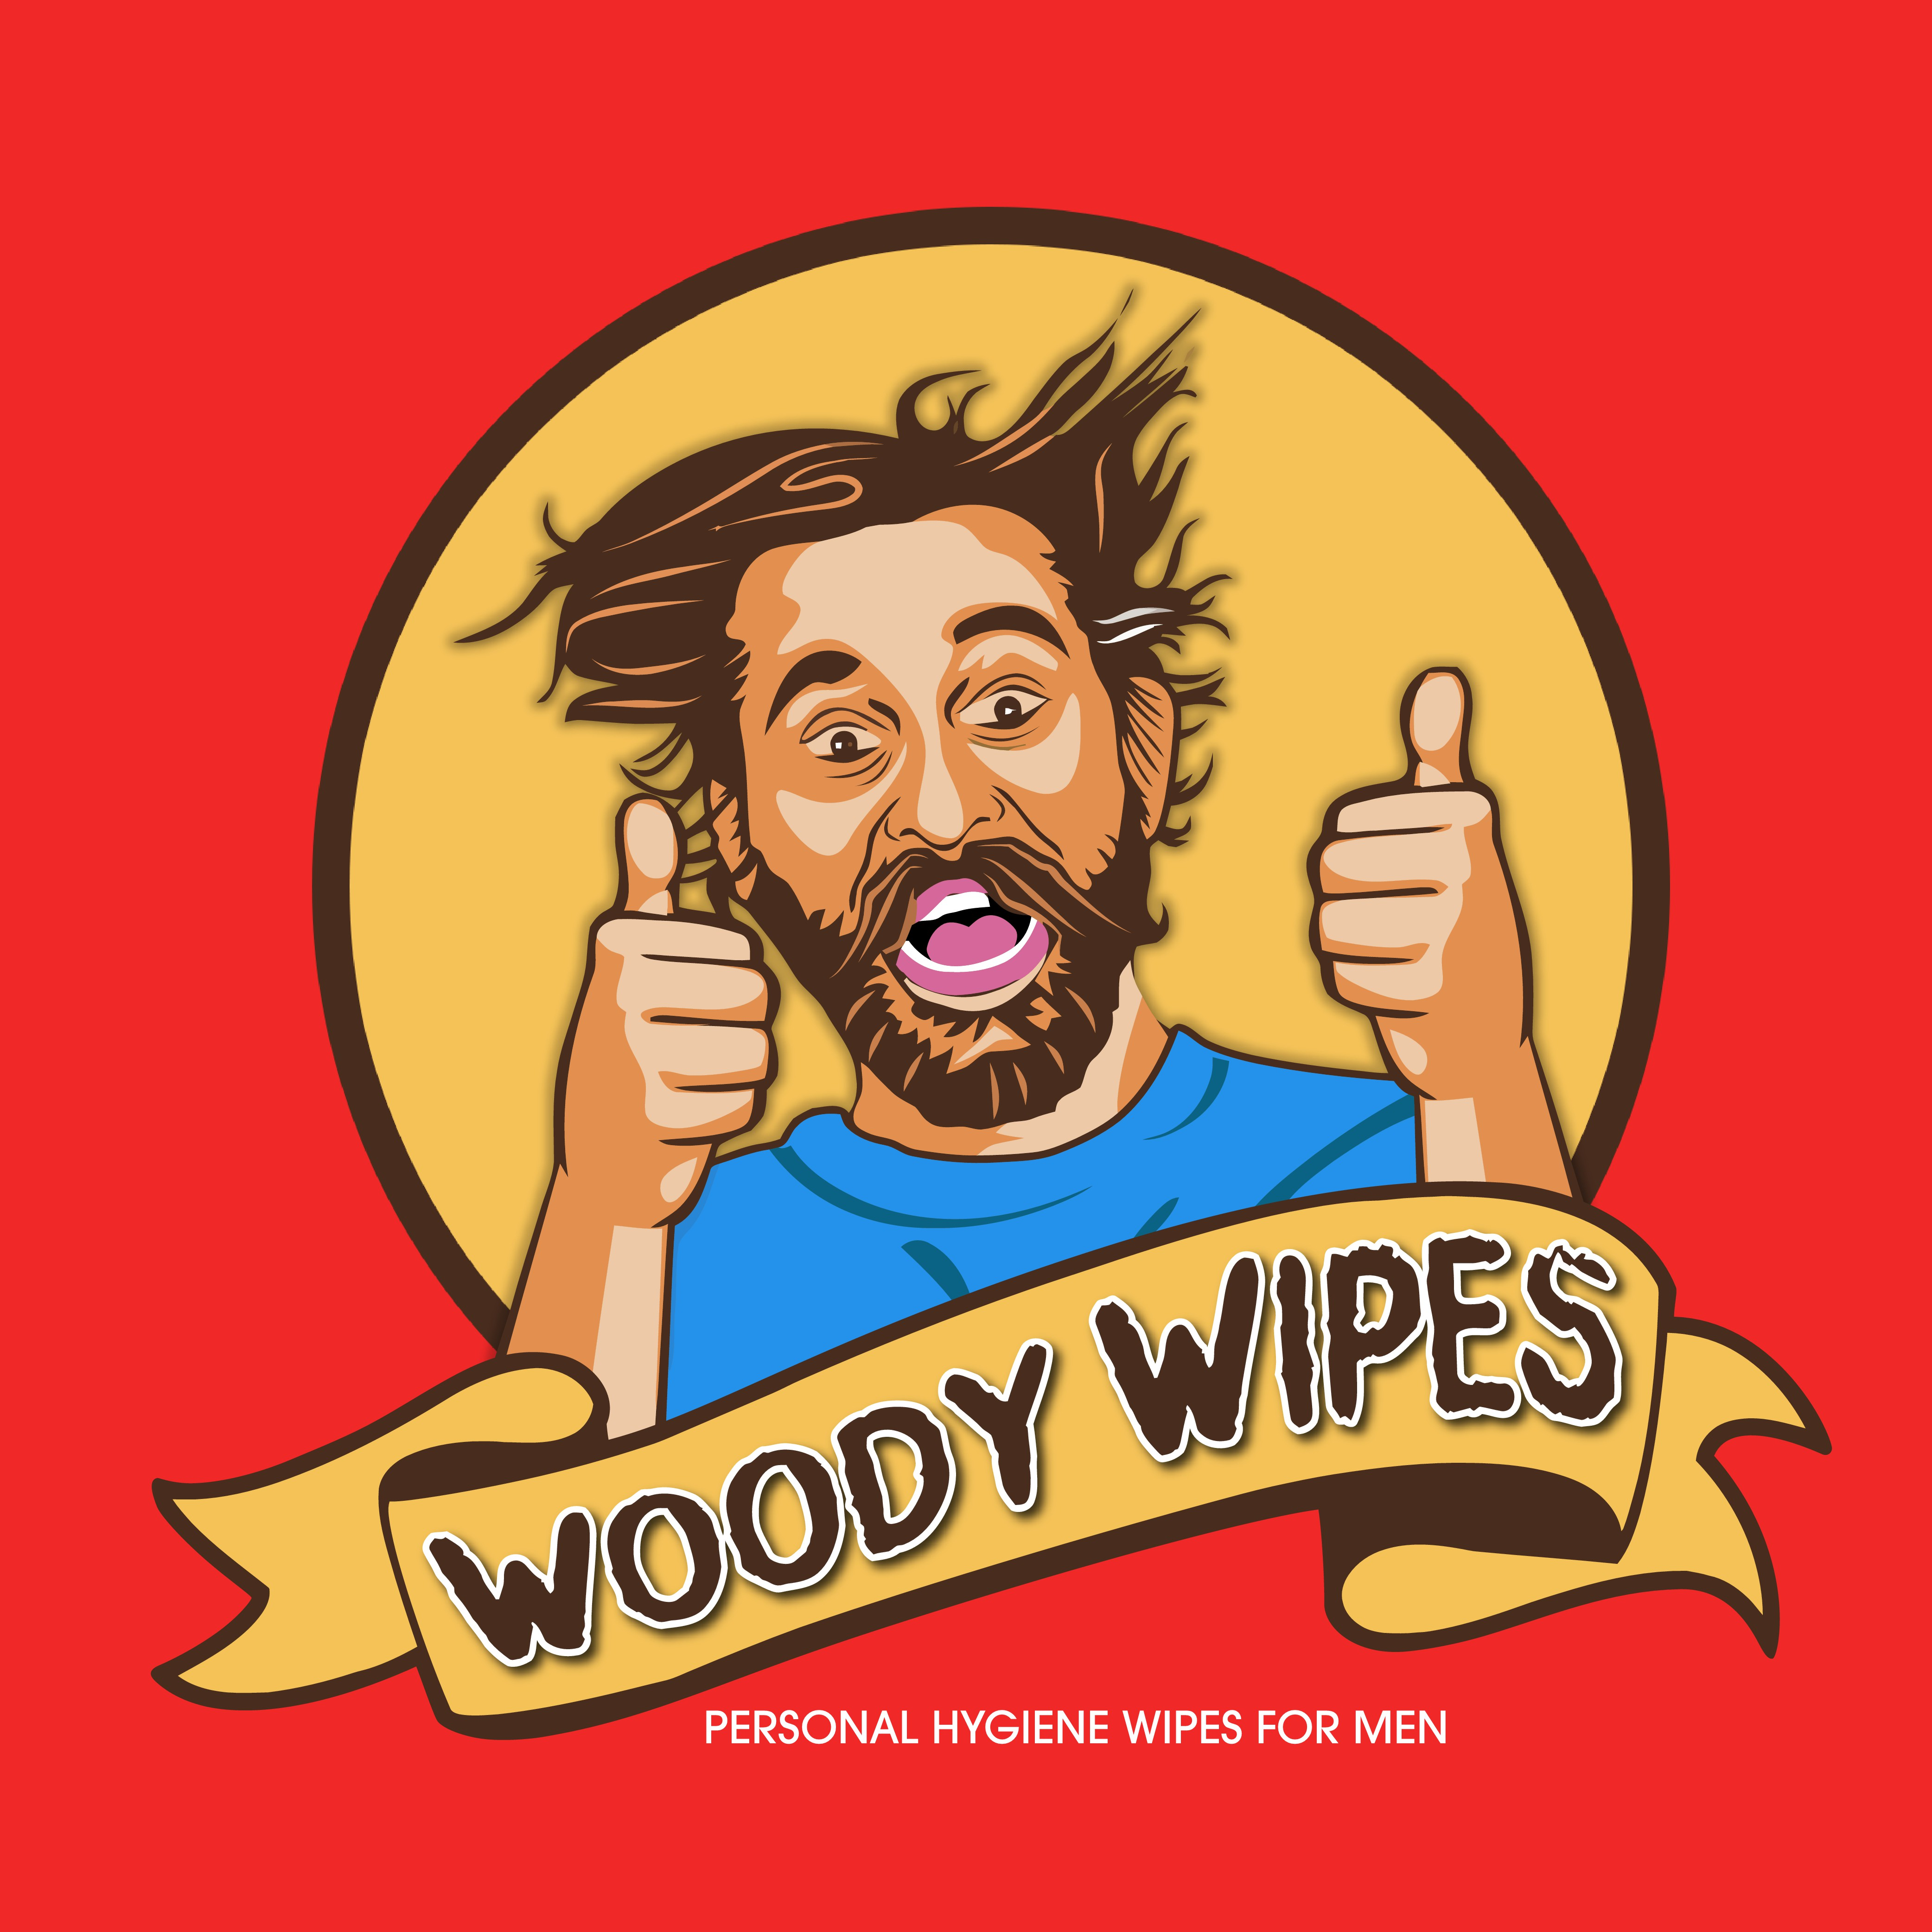 Woody Wipes Logo Design